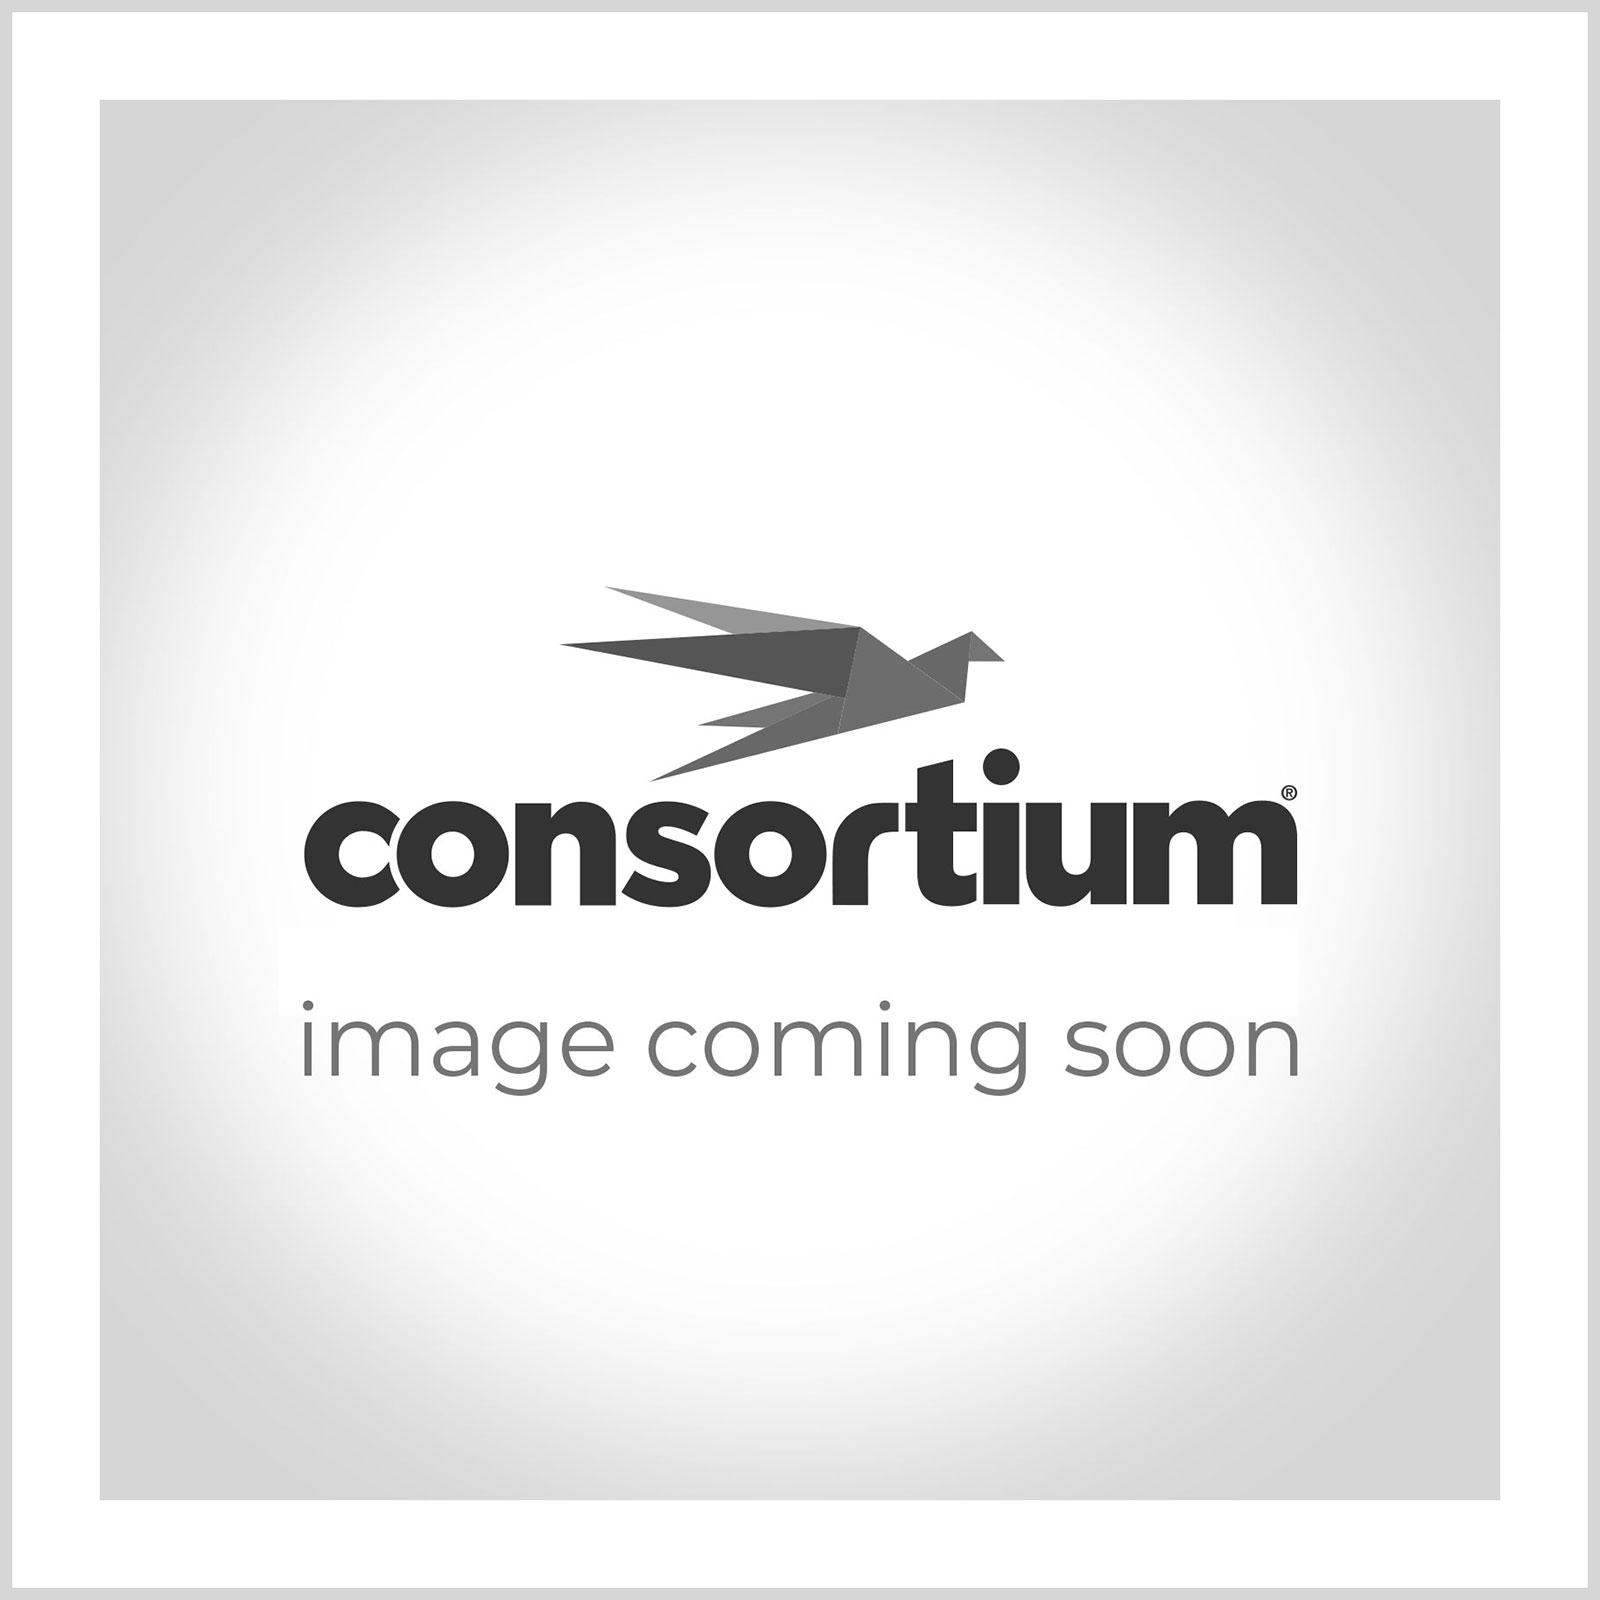 Consortium Hexagonal Chunky Colouring Pencils